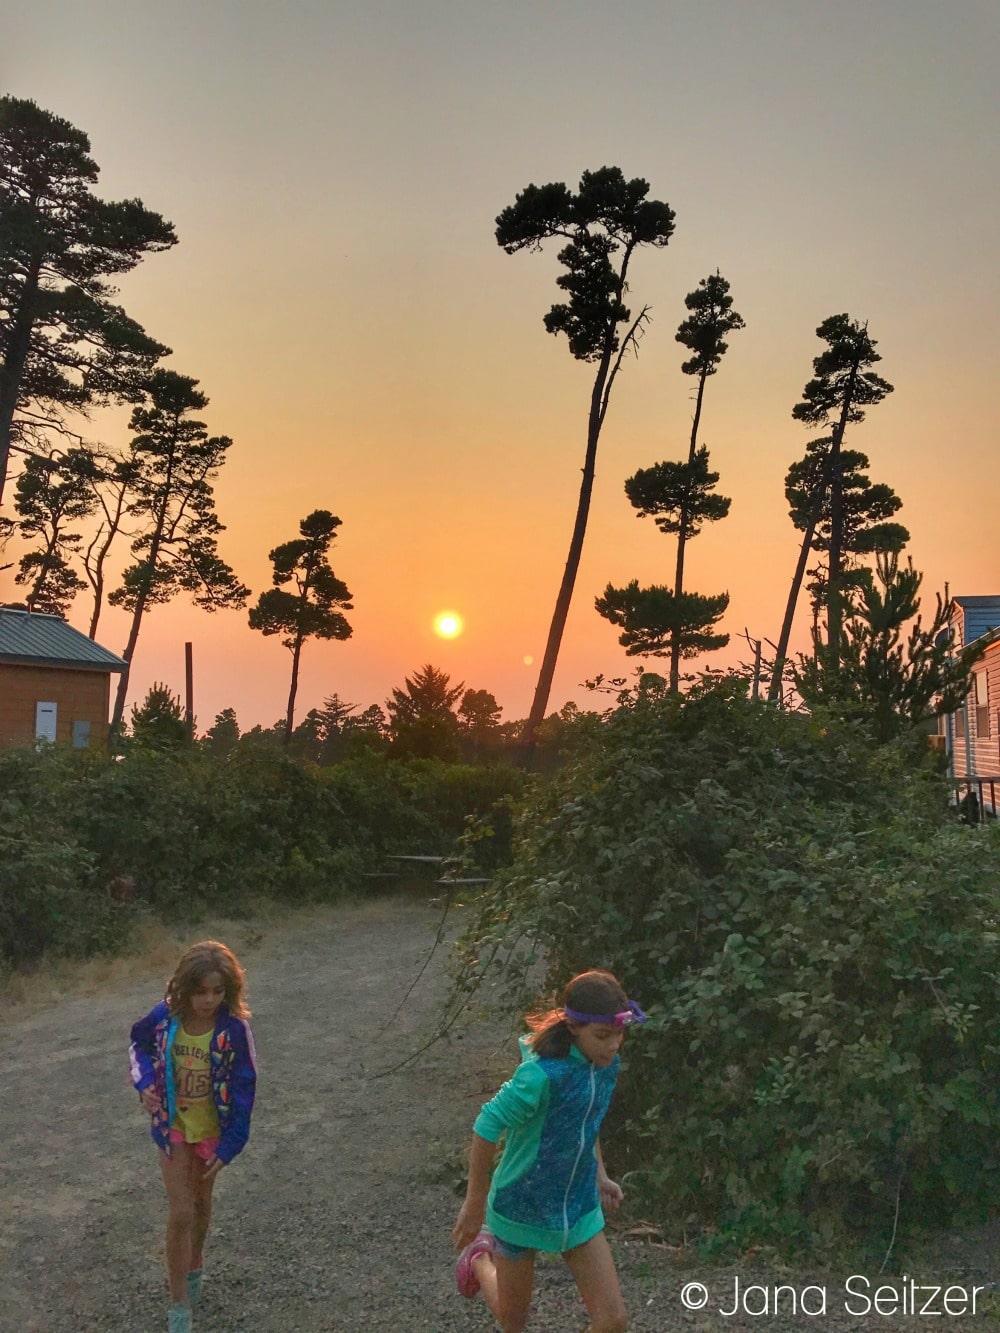 Family Camping Creates Lasting Memories at the Oregon Coast